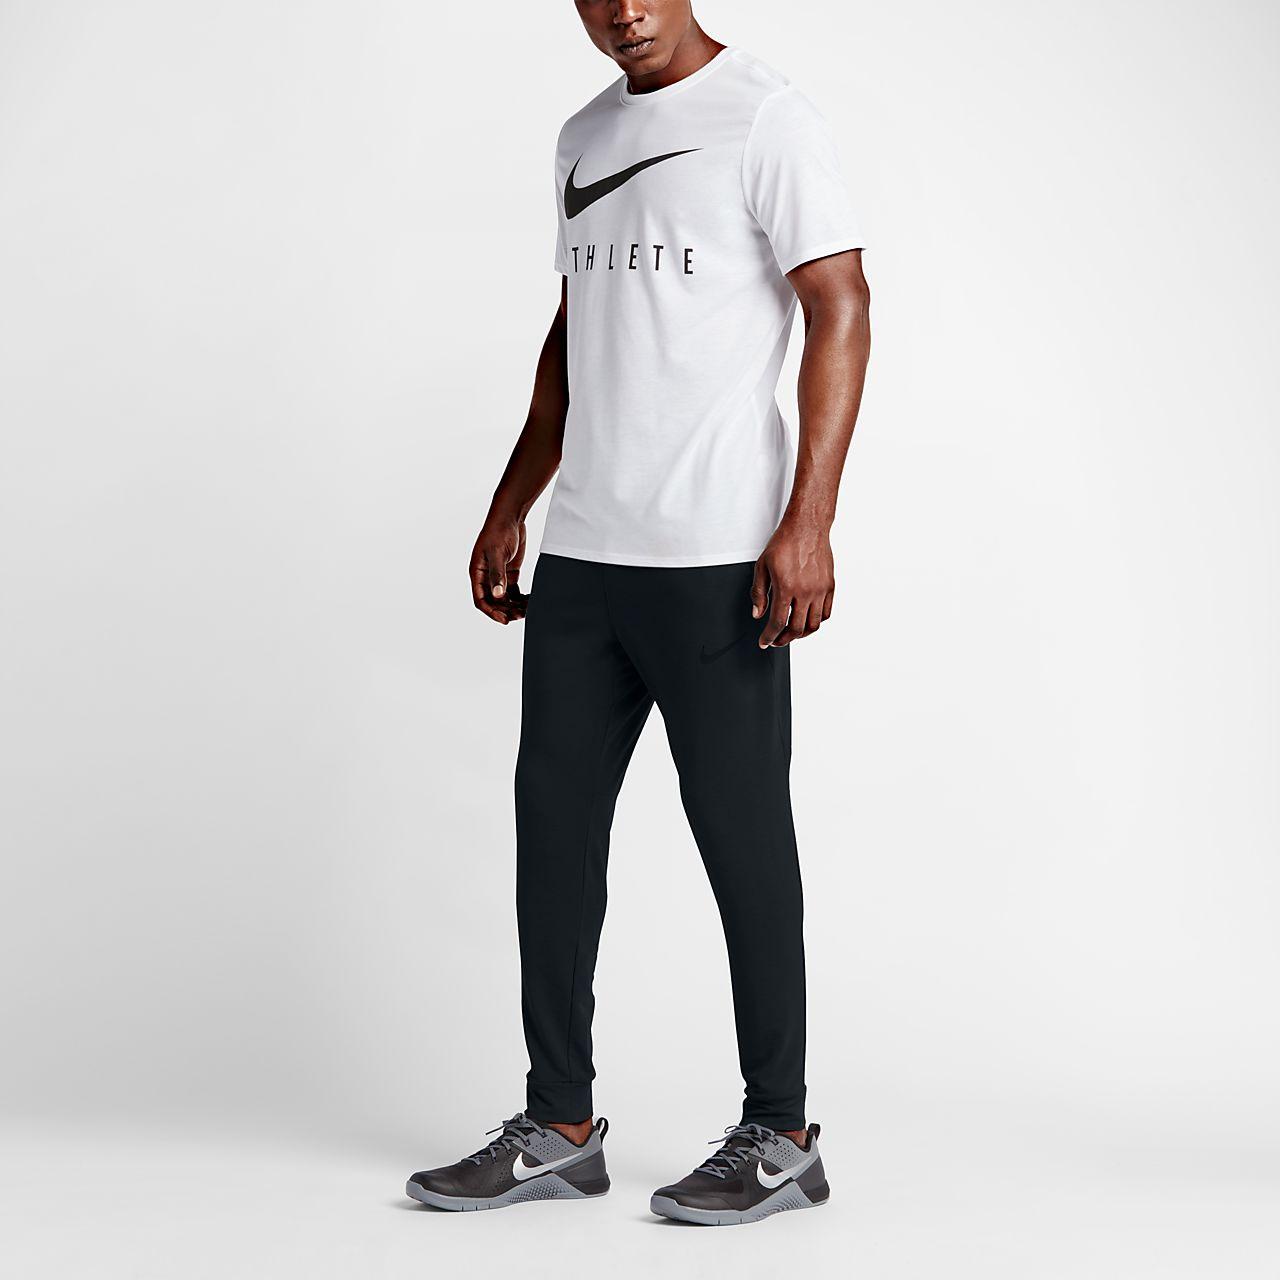 2c8d9a62d042b1 Nike Dri-FIT Fleece-Trainingshose für Herren. Nike.com AT